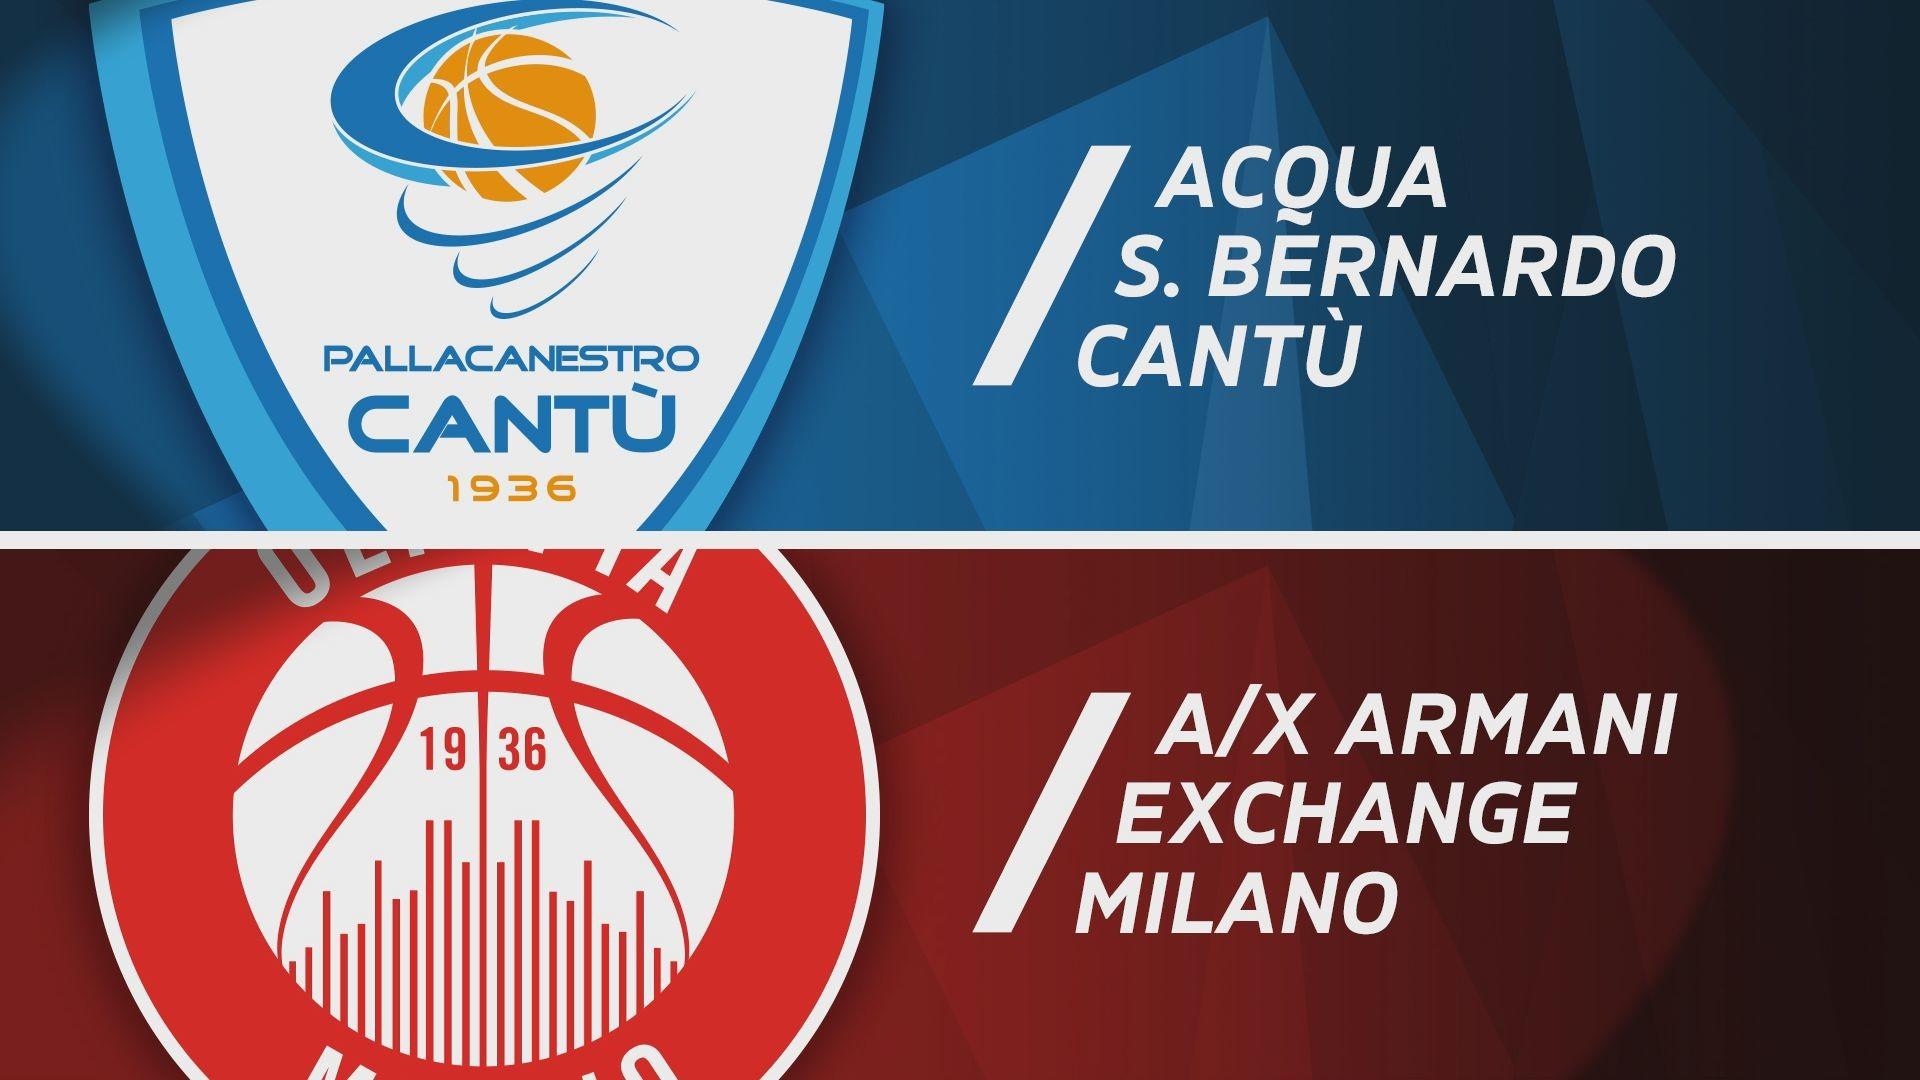 Acqua S.Bernardo Cantù - A|X Armani Exchange Milano 71-89